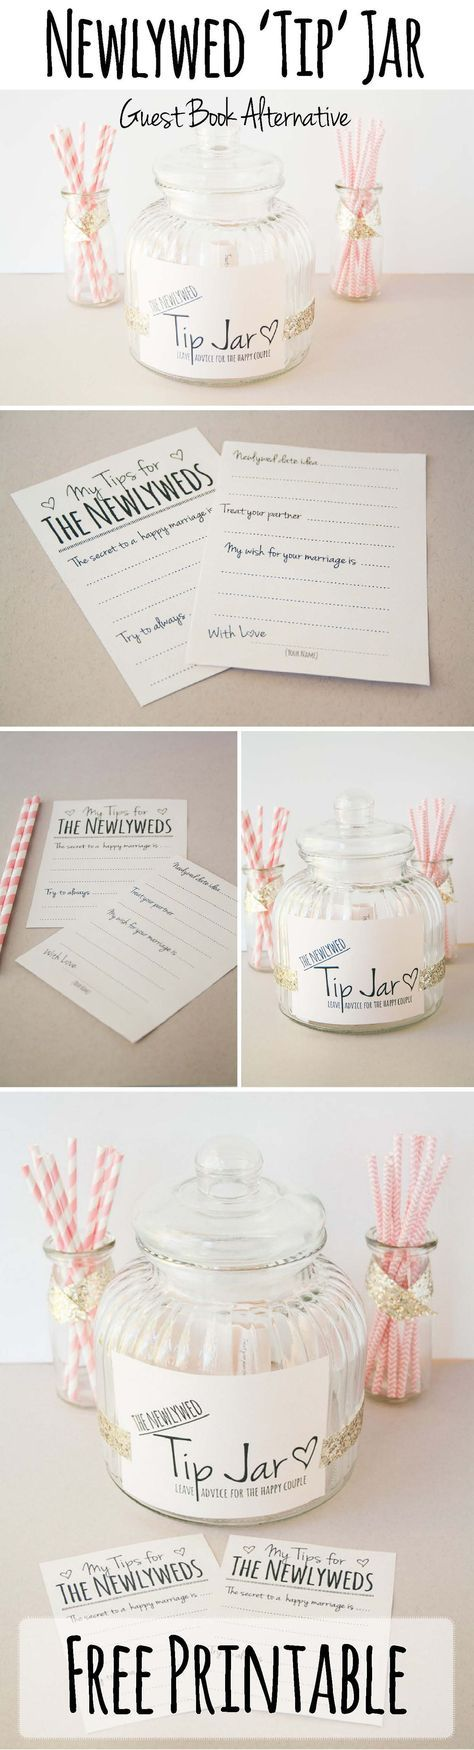 best inspiration wedding images on pinterest